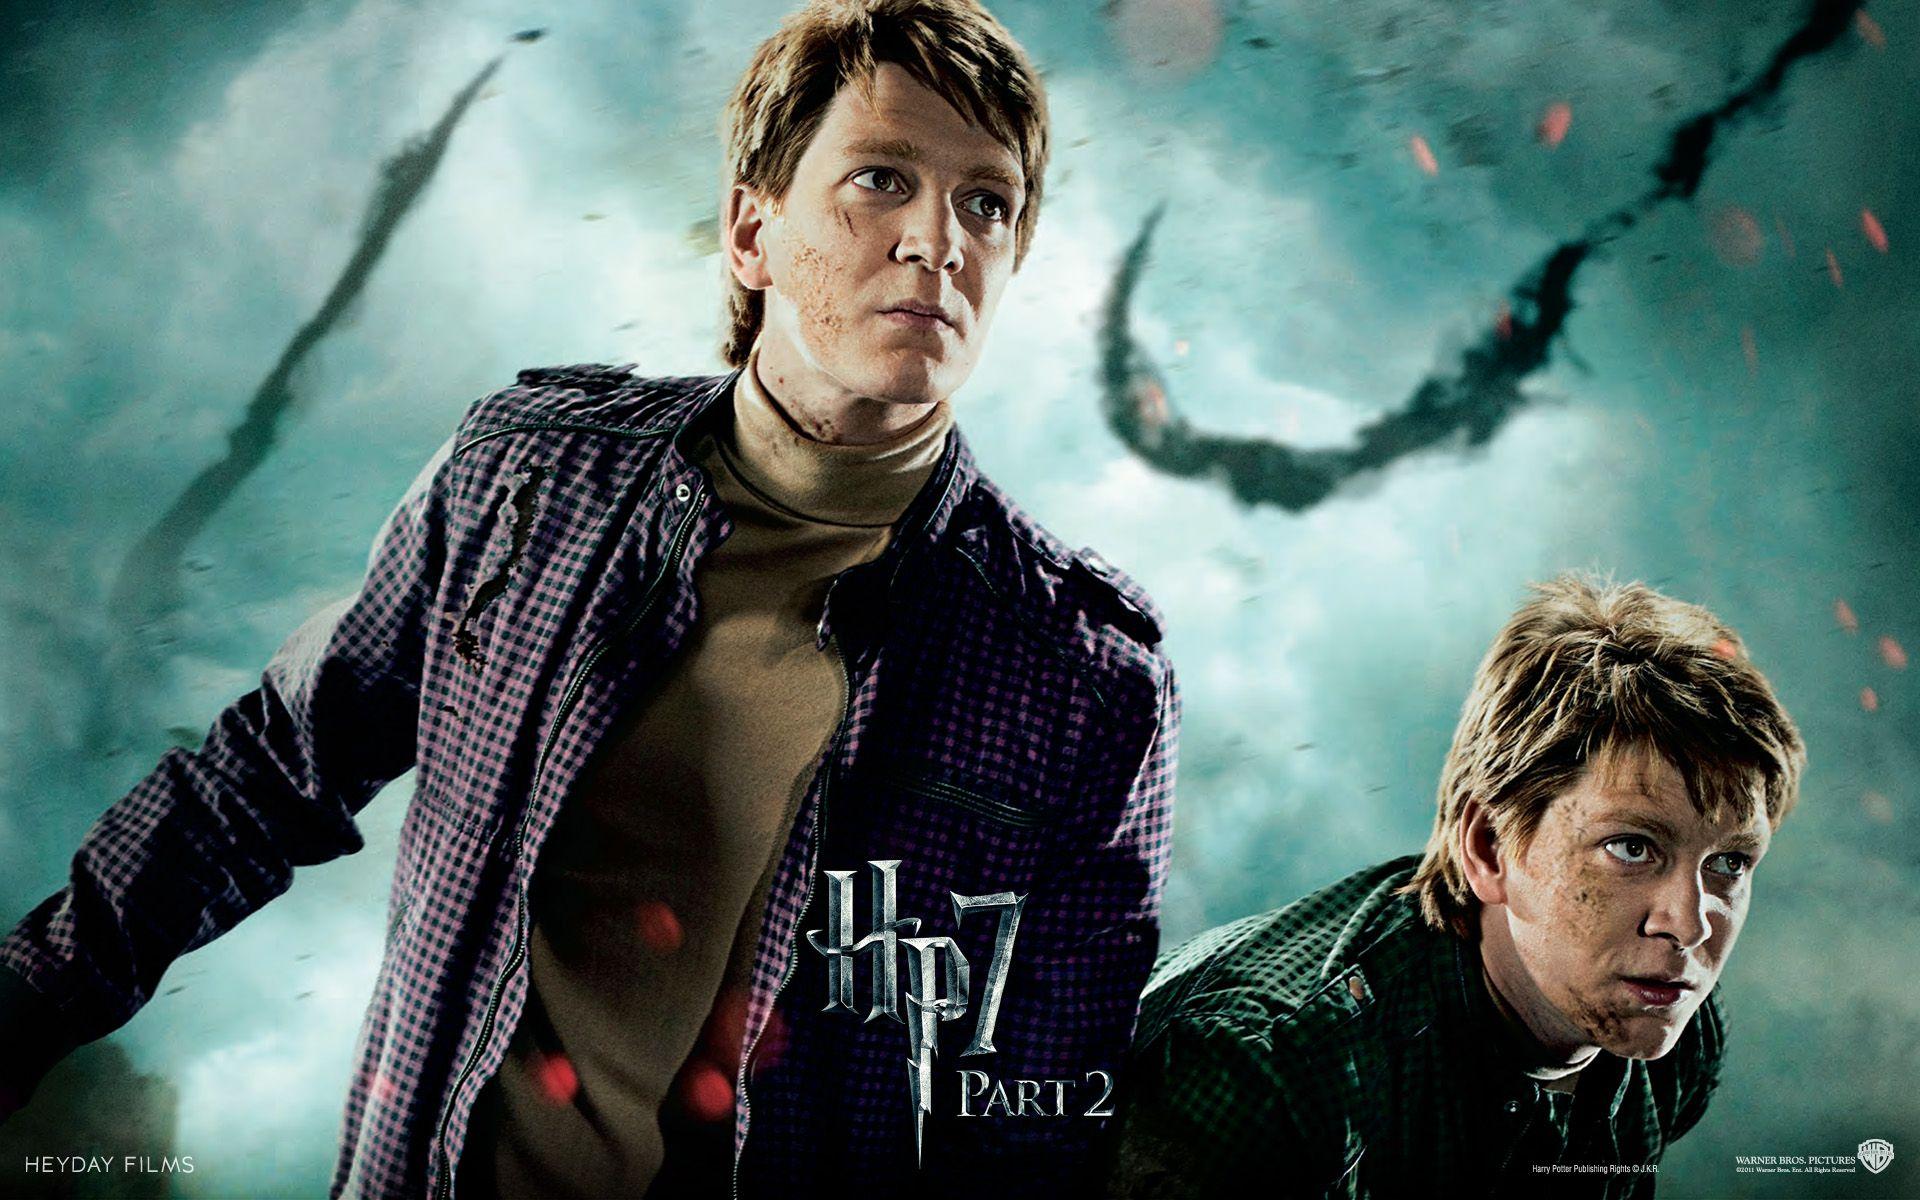 Most Inspiring Wallpaper Harry Potter Love - 46aa5b82116fa2649bd636dcf647bdc5  Image_276894.jpg